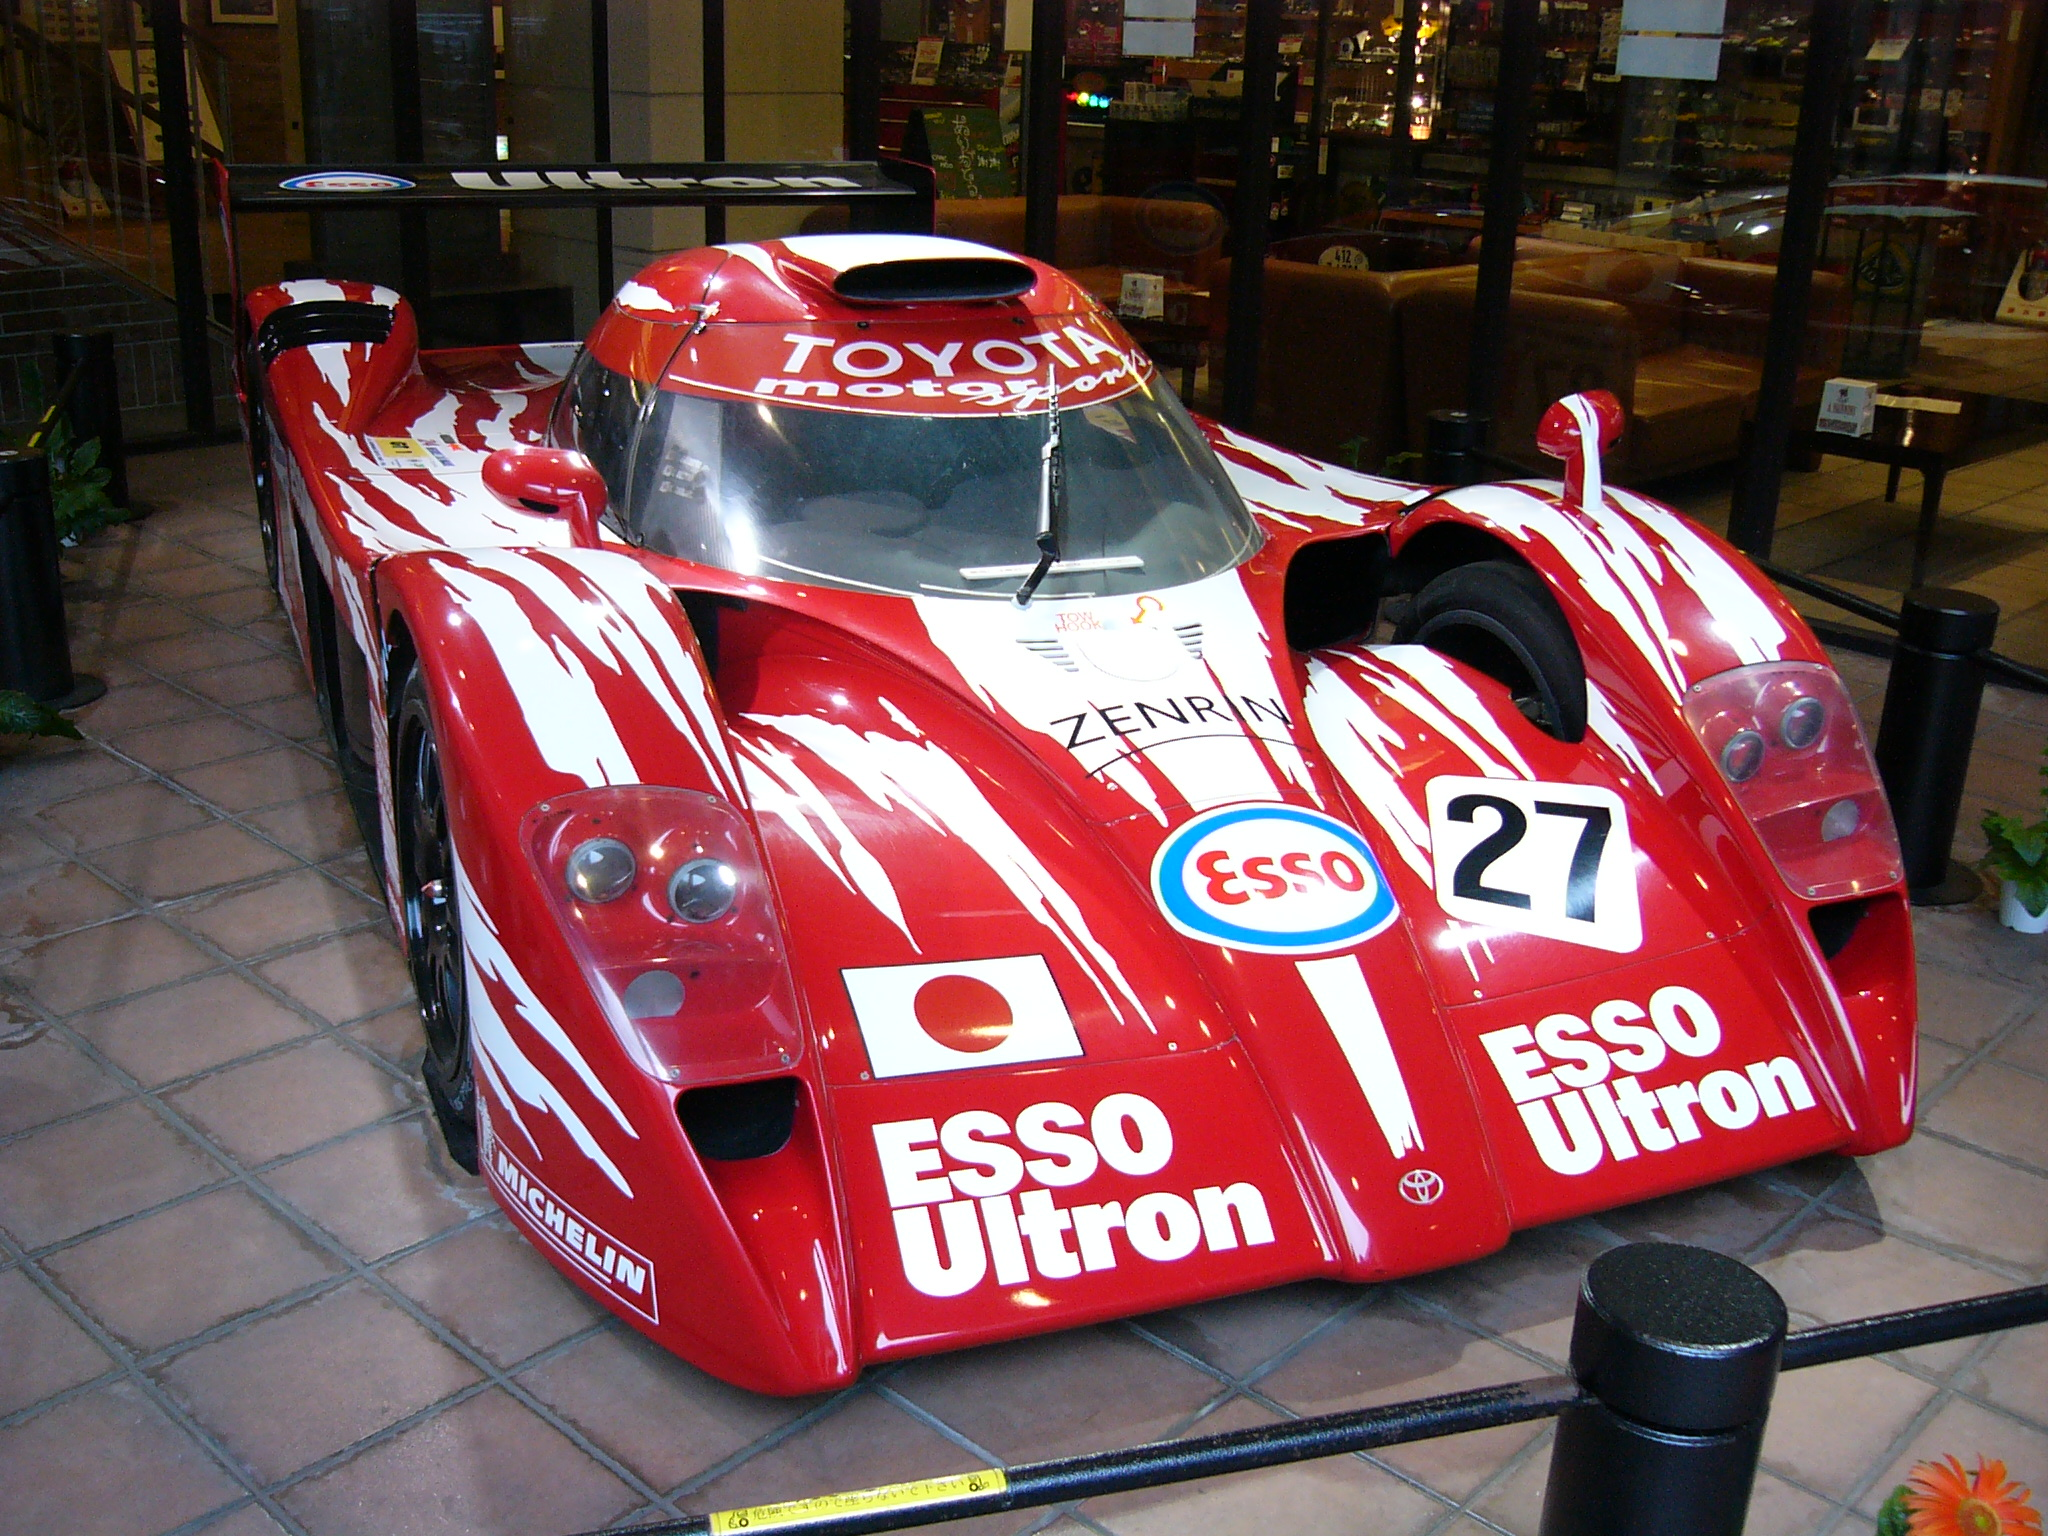 [Image: Toyota_GT-One_2005-06-02.JPG]